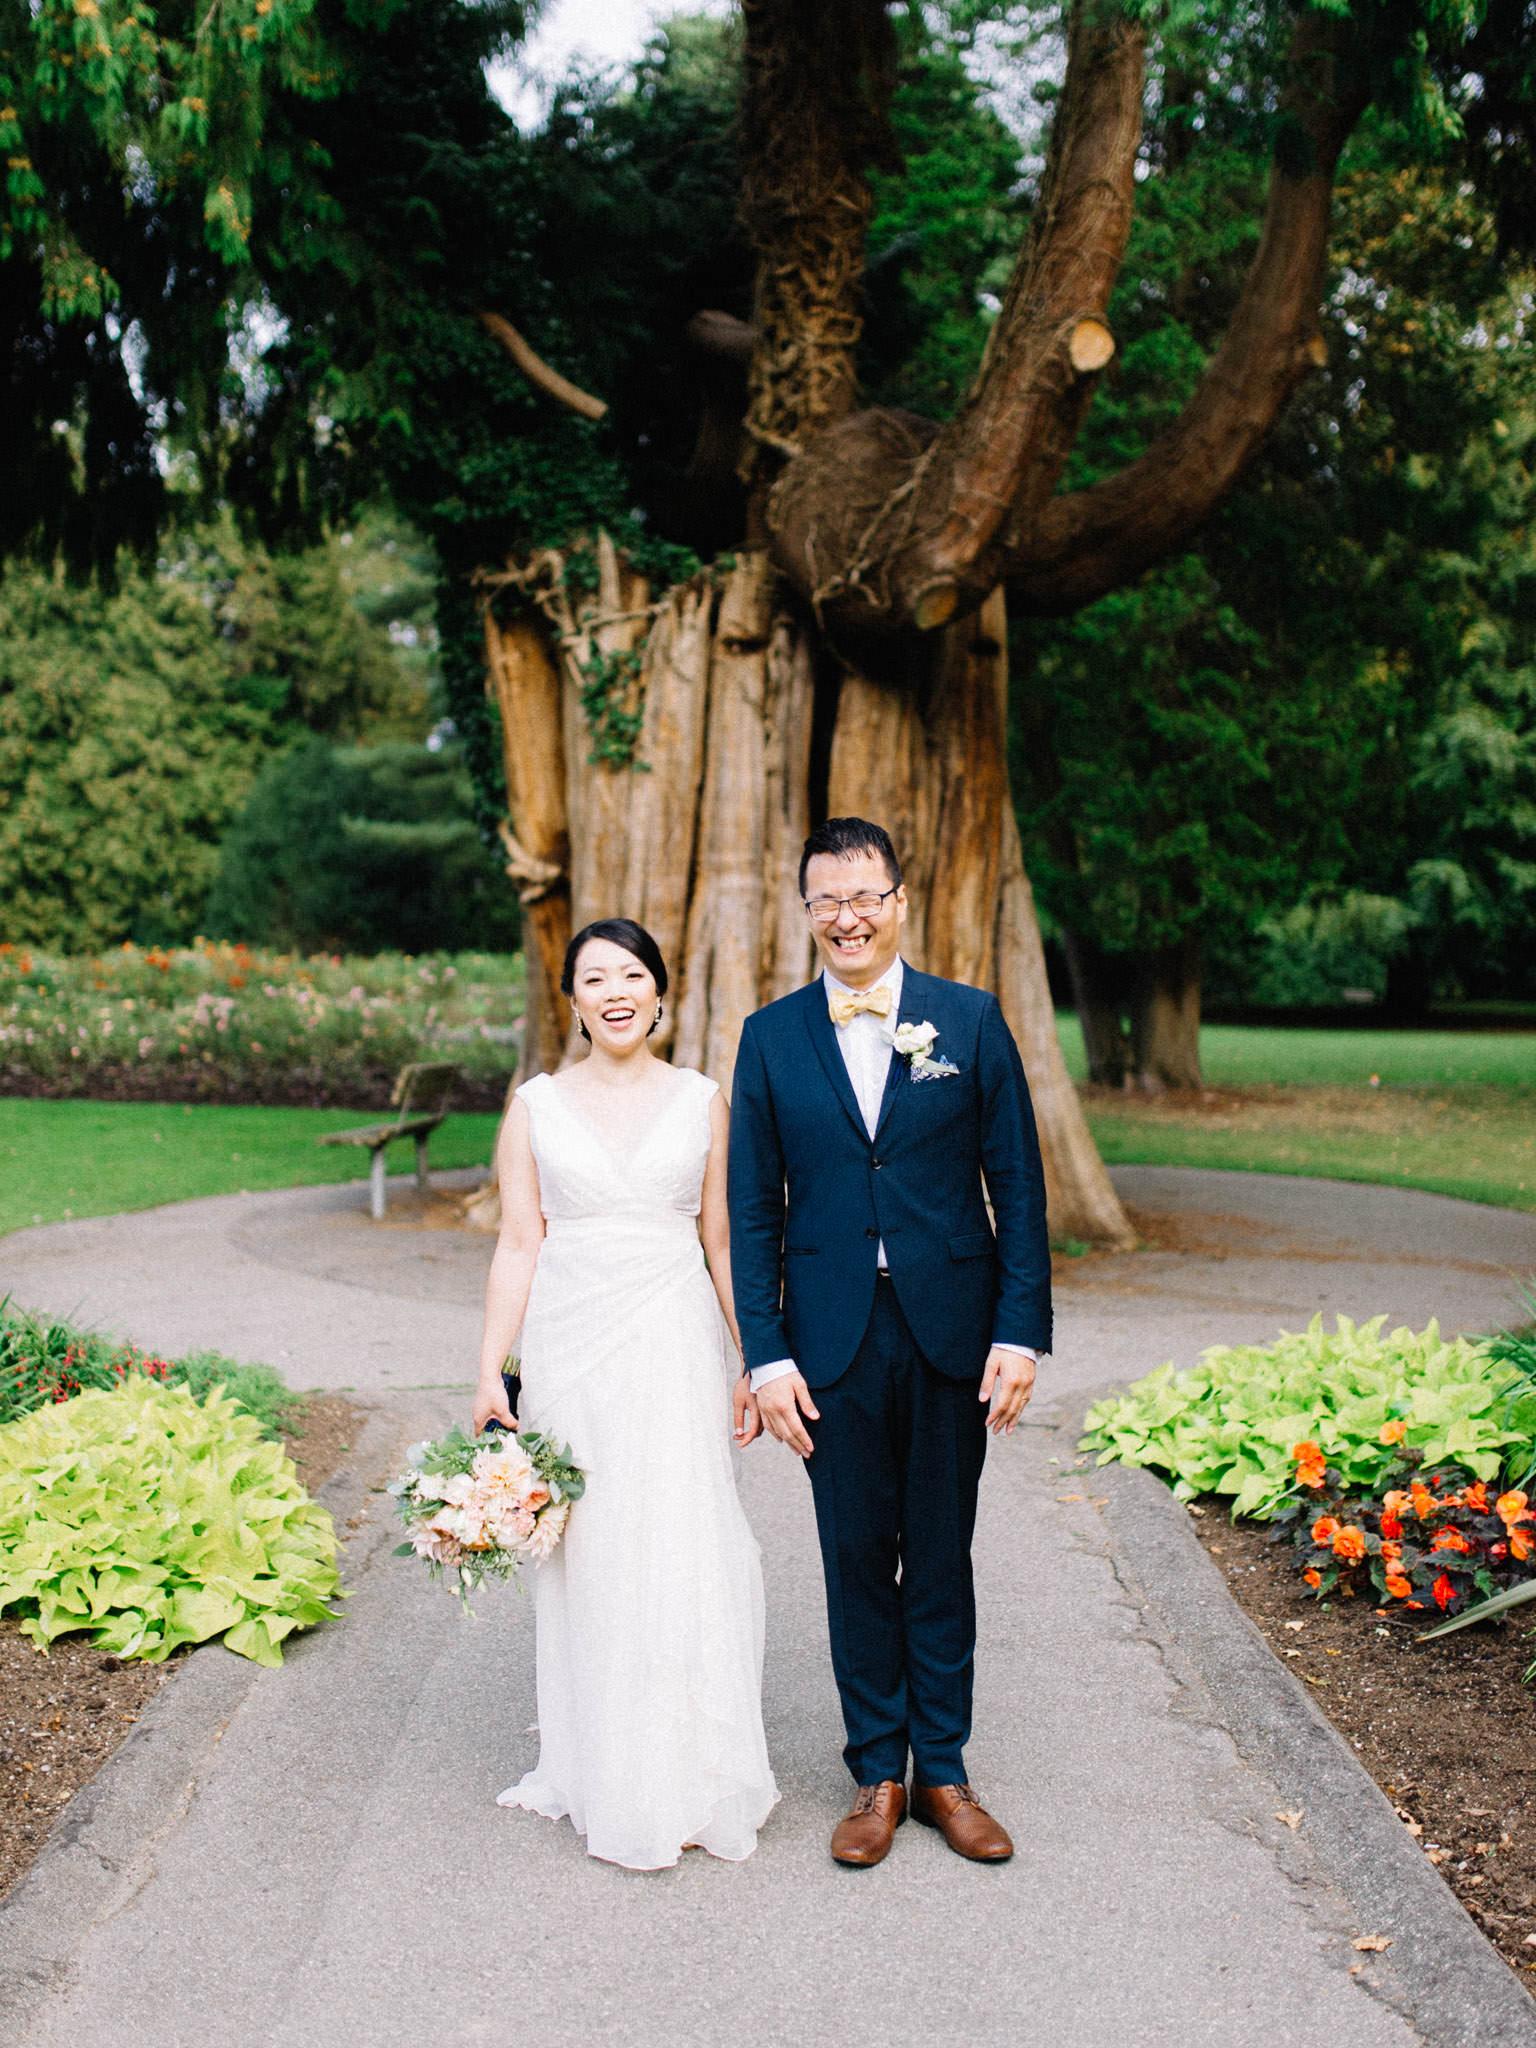 Stanley Park wedding photography